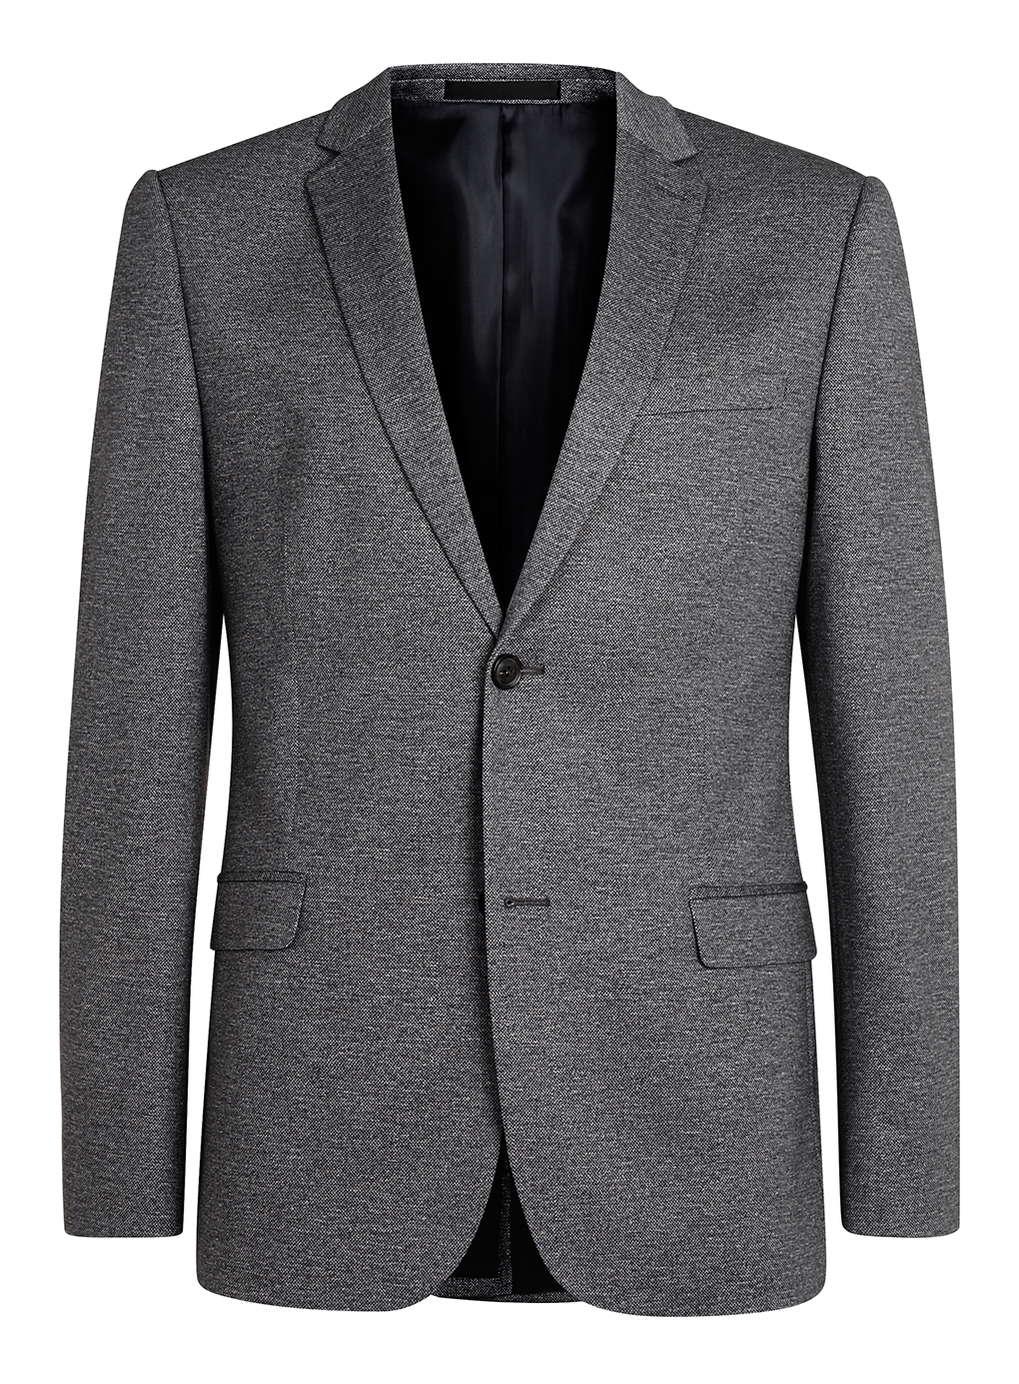 Topman Grey Blazer